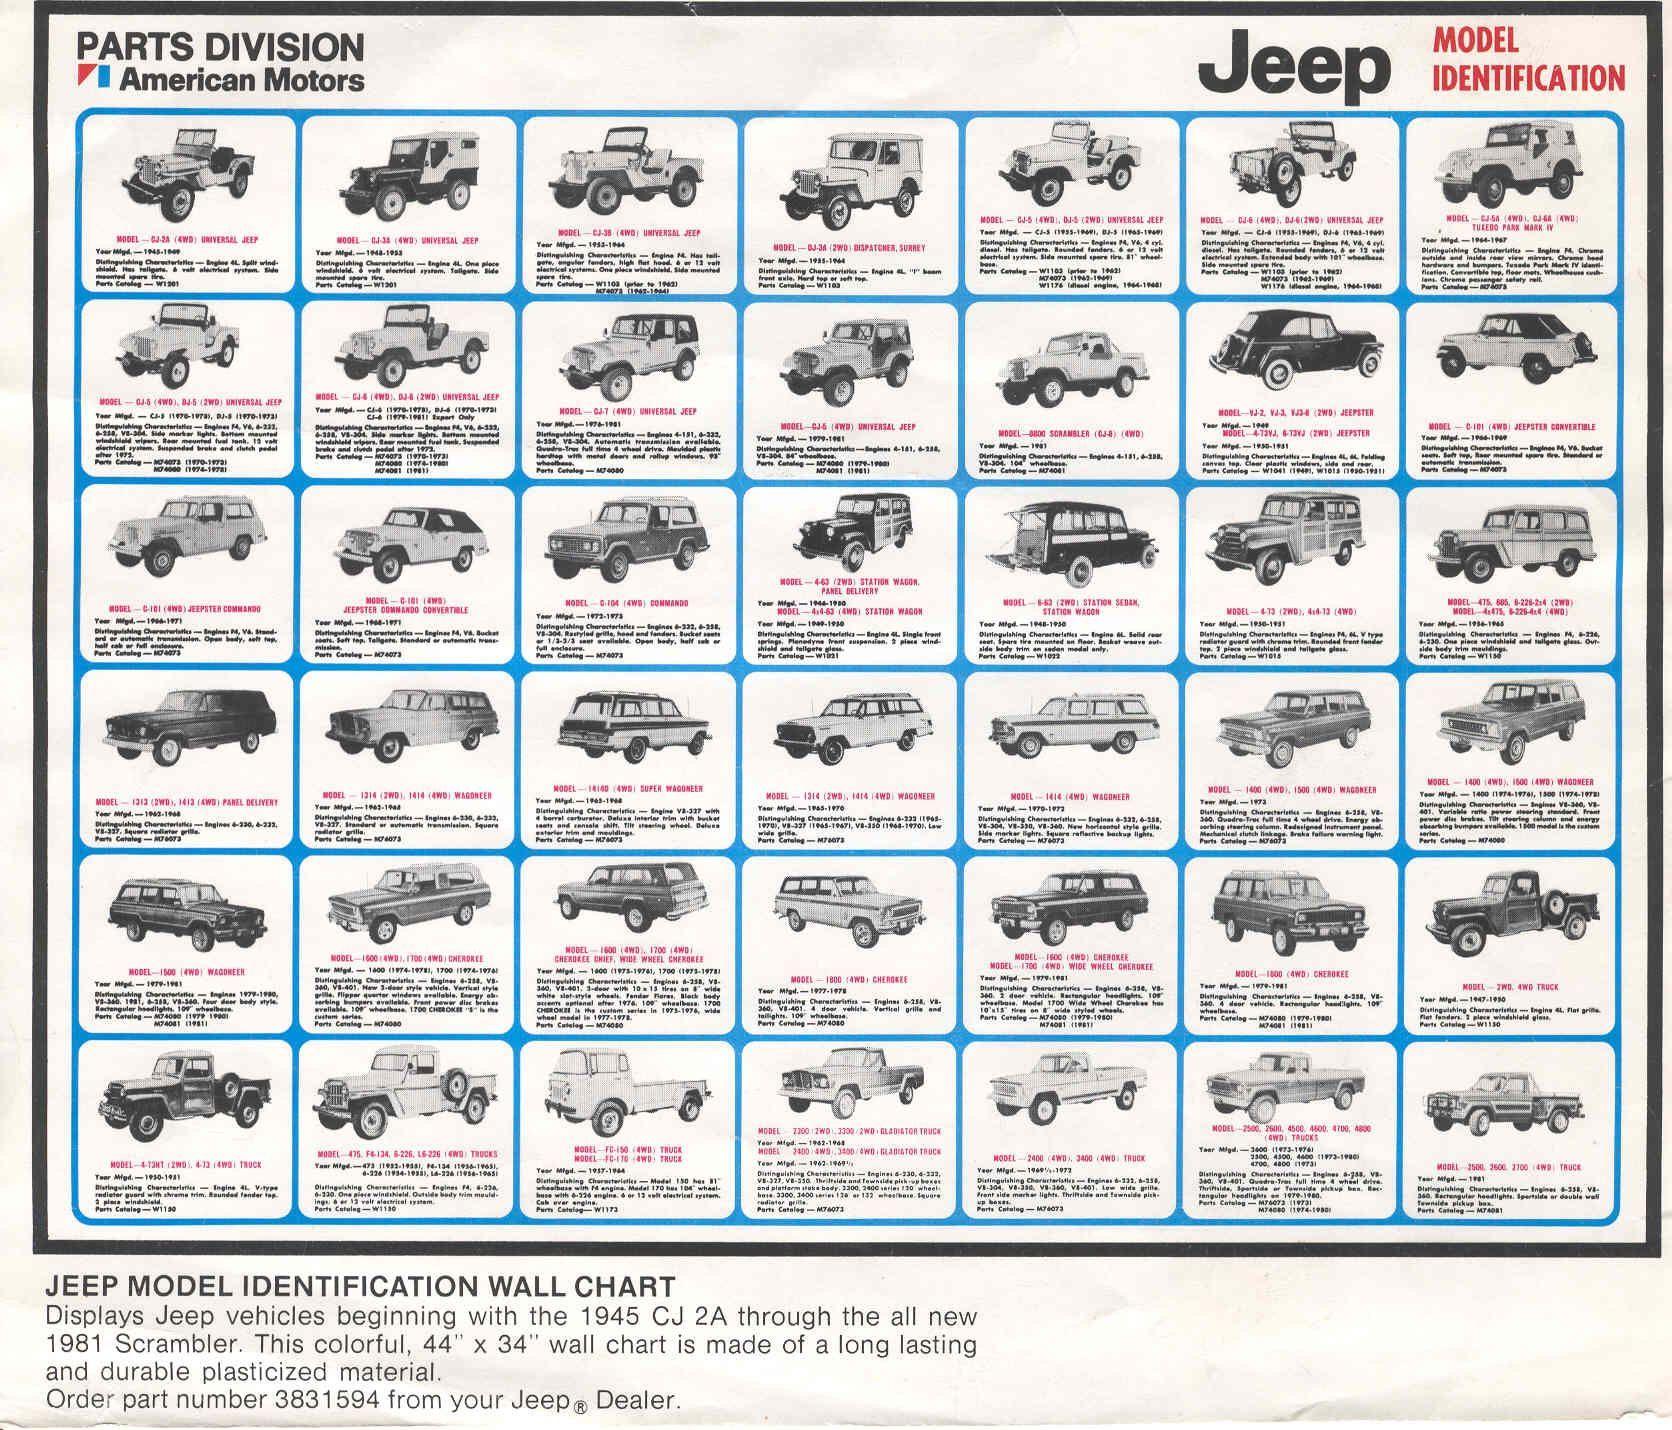 Jeep wrangler model comparison chart best images on pinterest wranglers and also hobit fullring rh